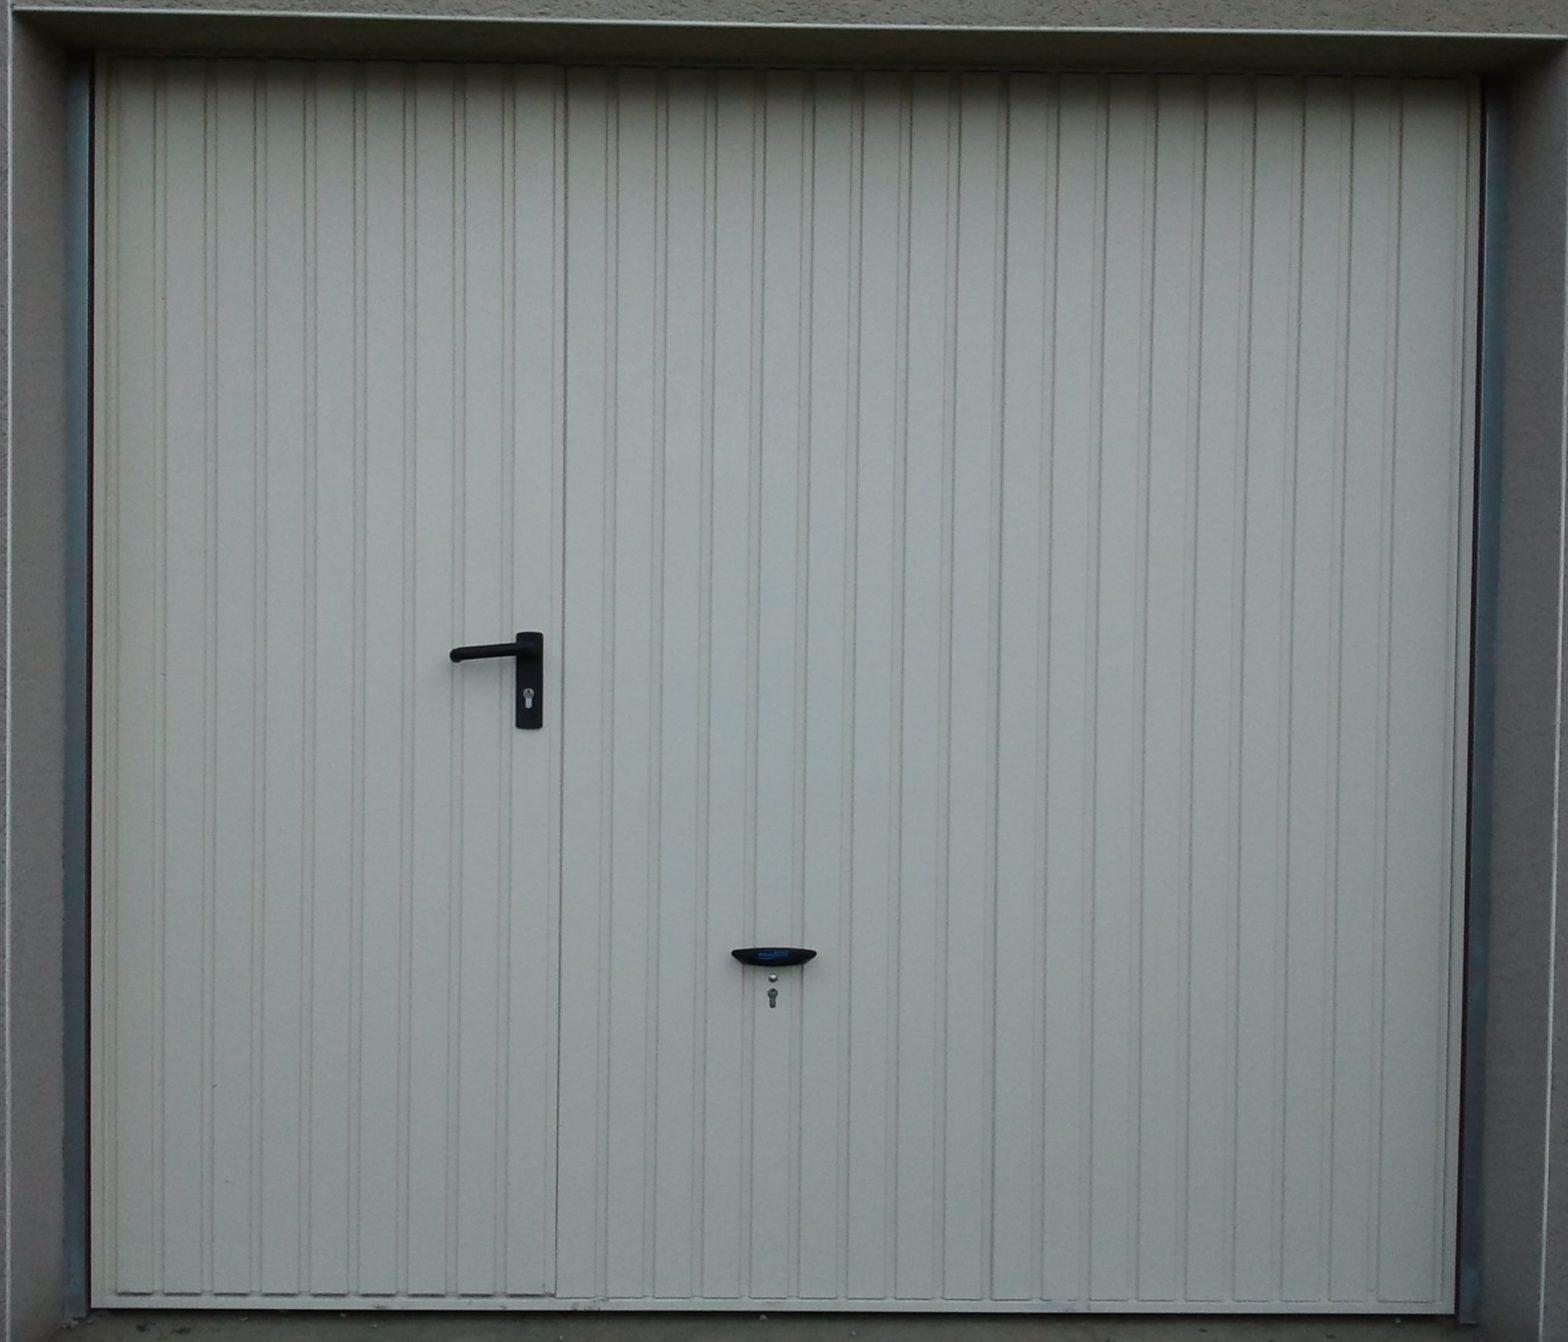 menuiserie-exterieure-porte-de-garage-basculante-avec-portillon-blanc-49-beaucouze